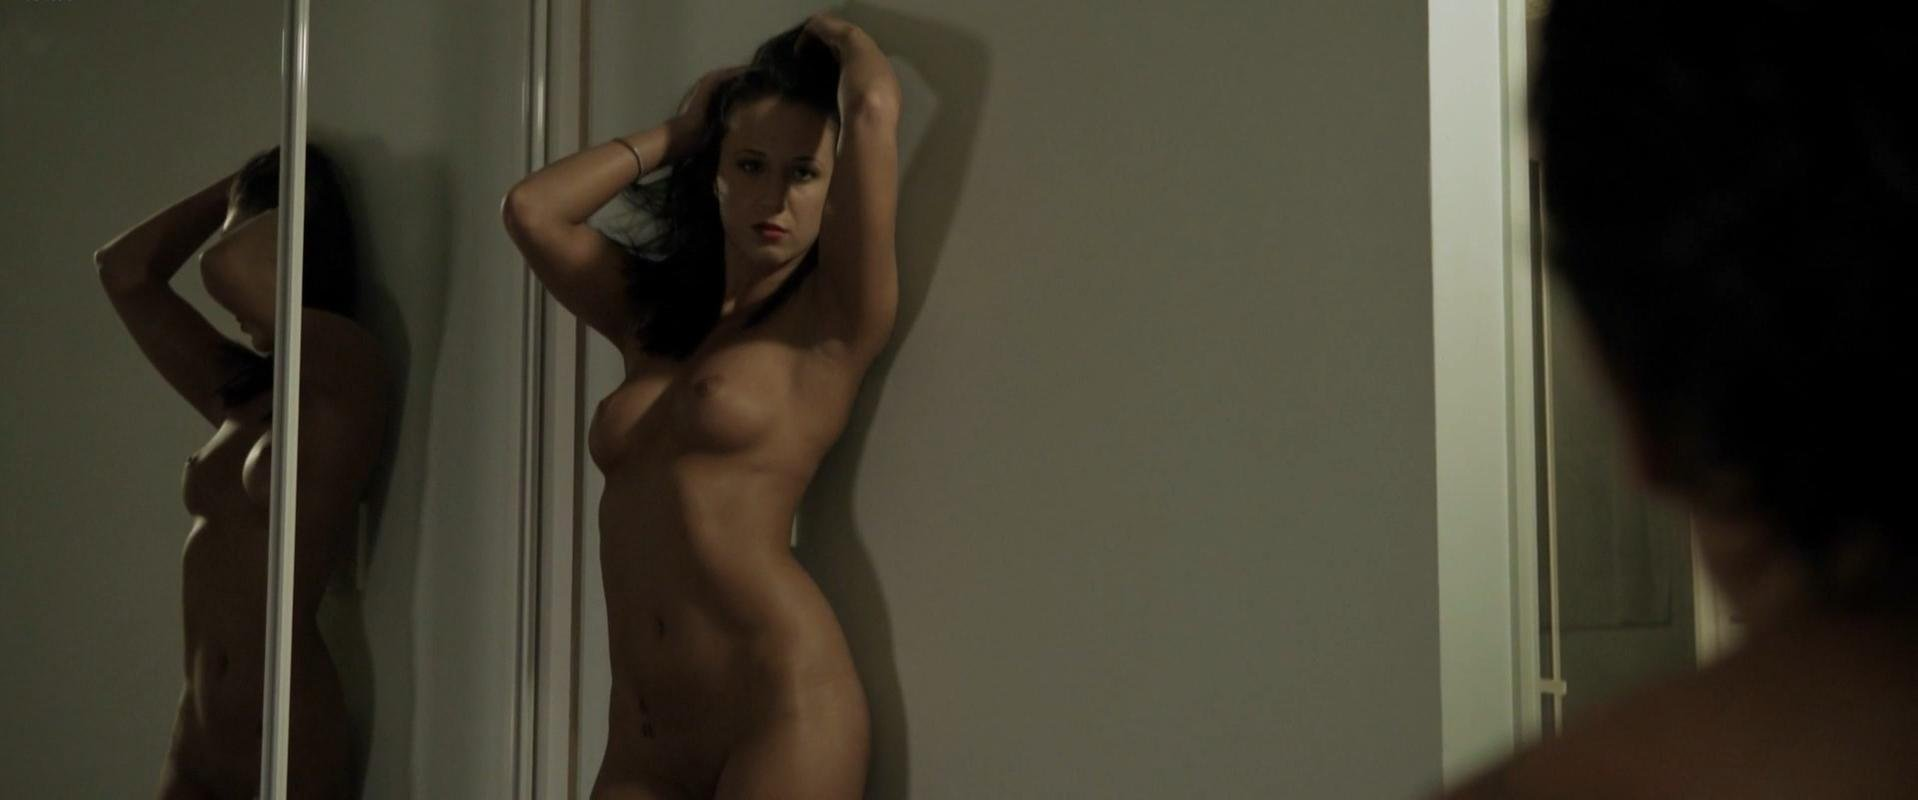 Anna Mowry nude - Bad Karma (2012)